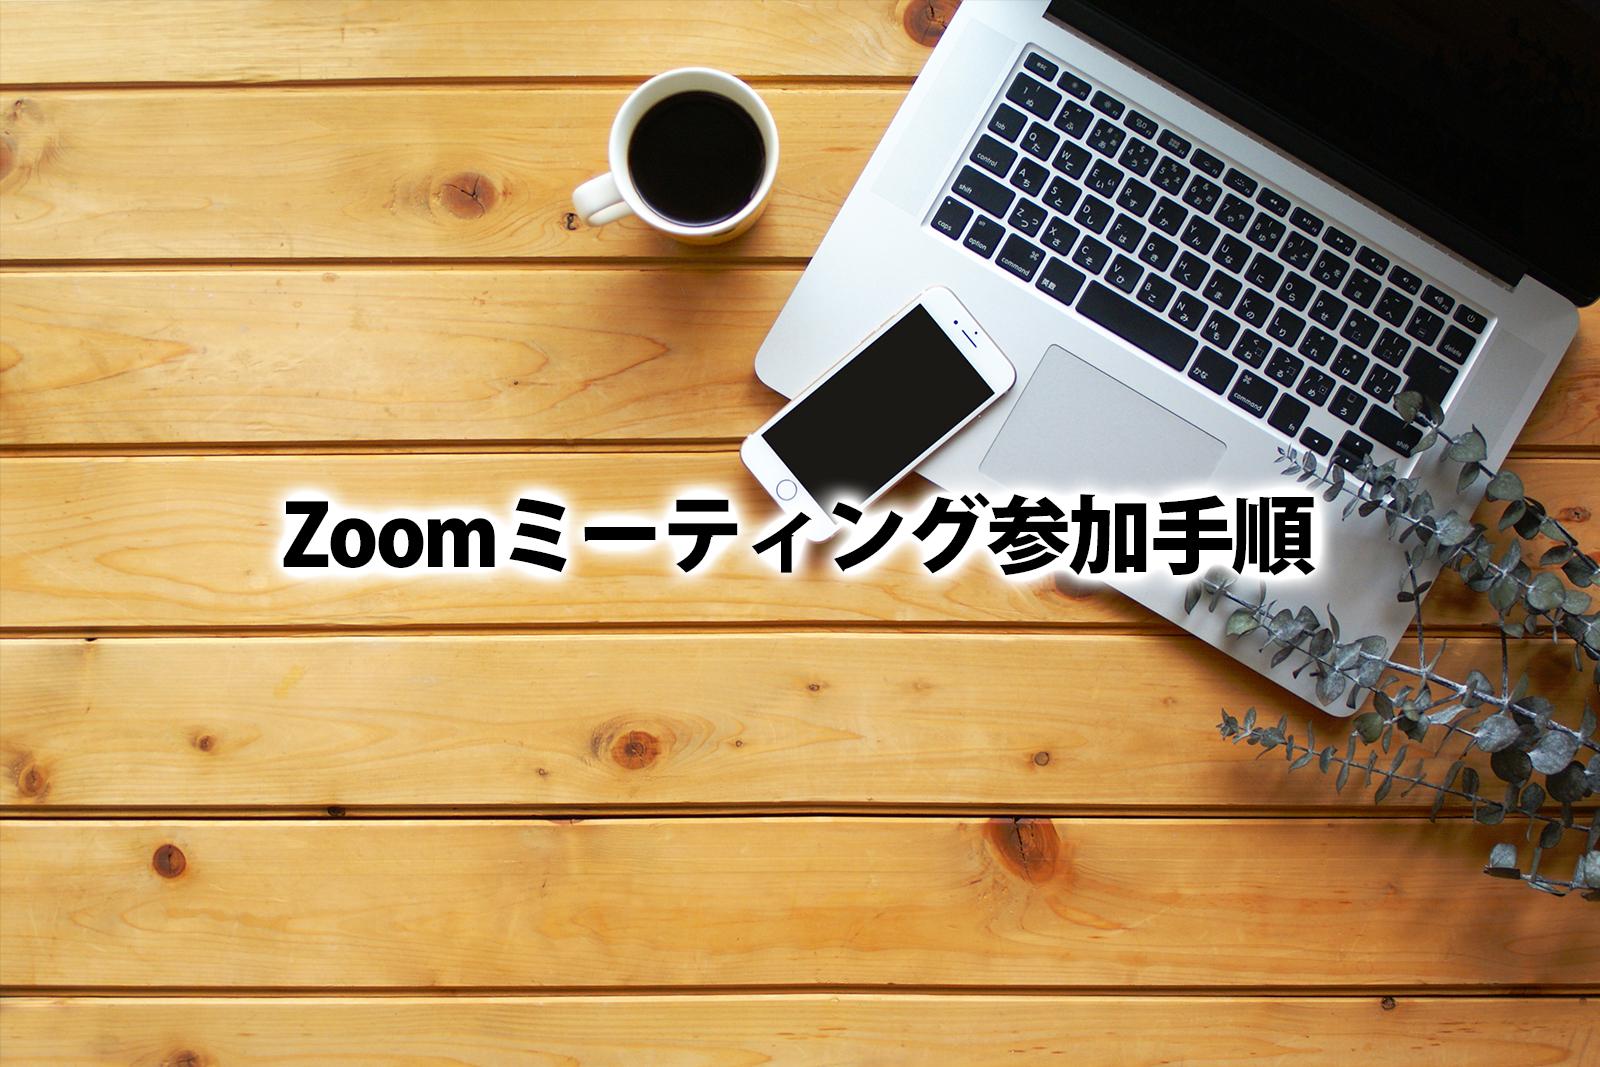 Zoomミーティング参加手順